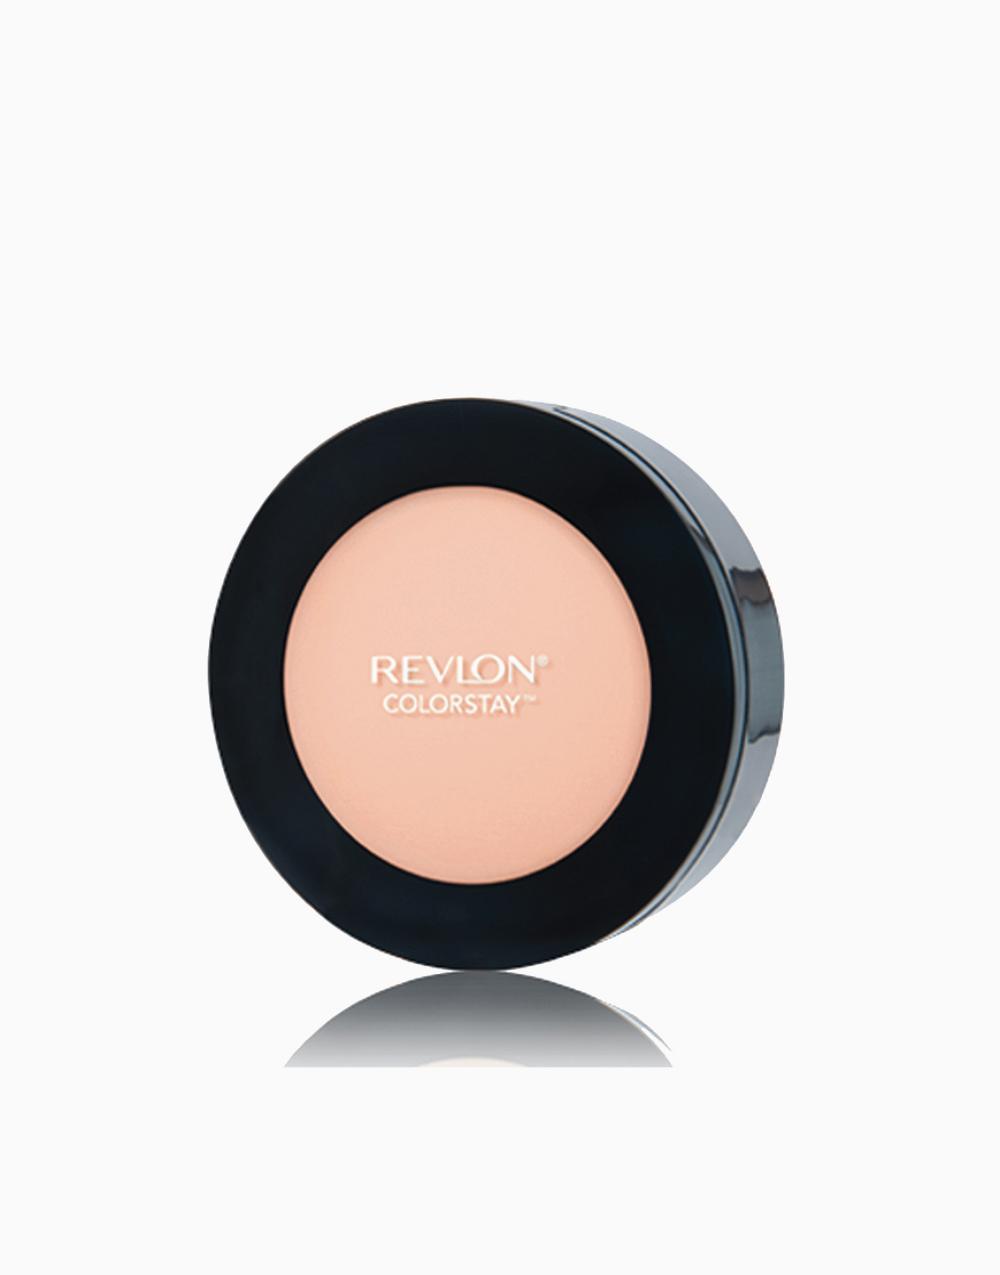 ColorStay Pressed Powder by Revlon | 840 Medium